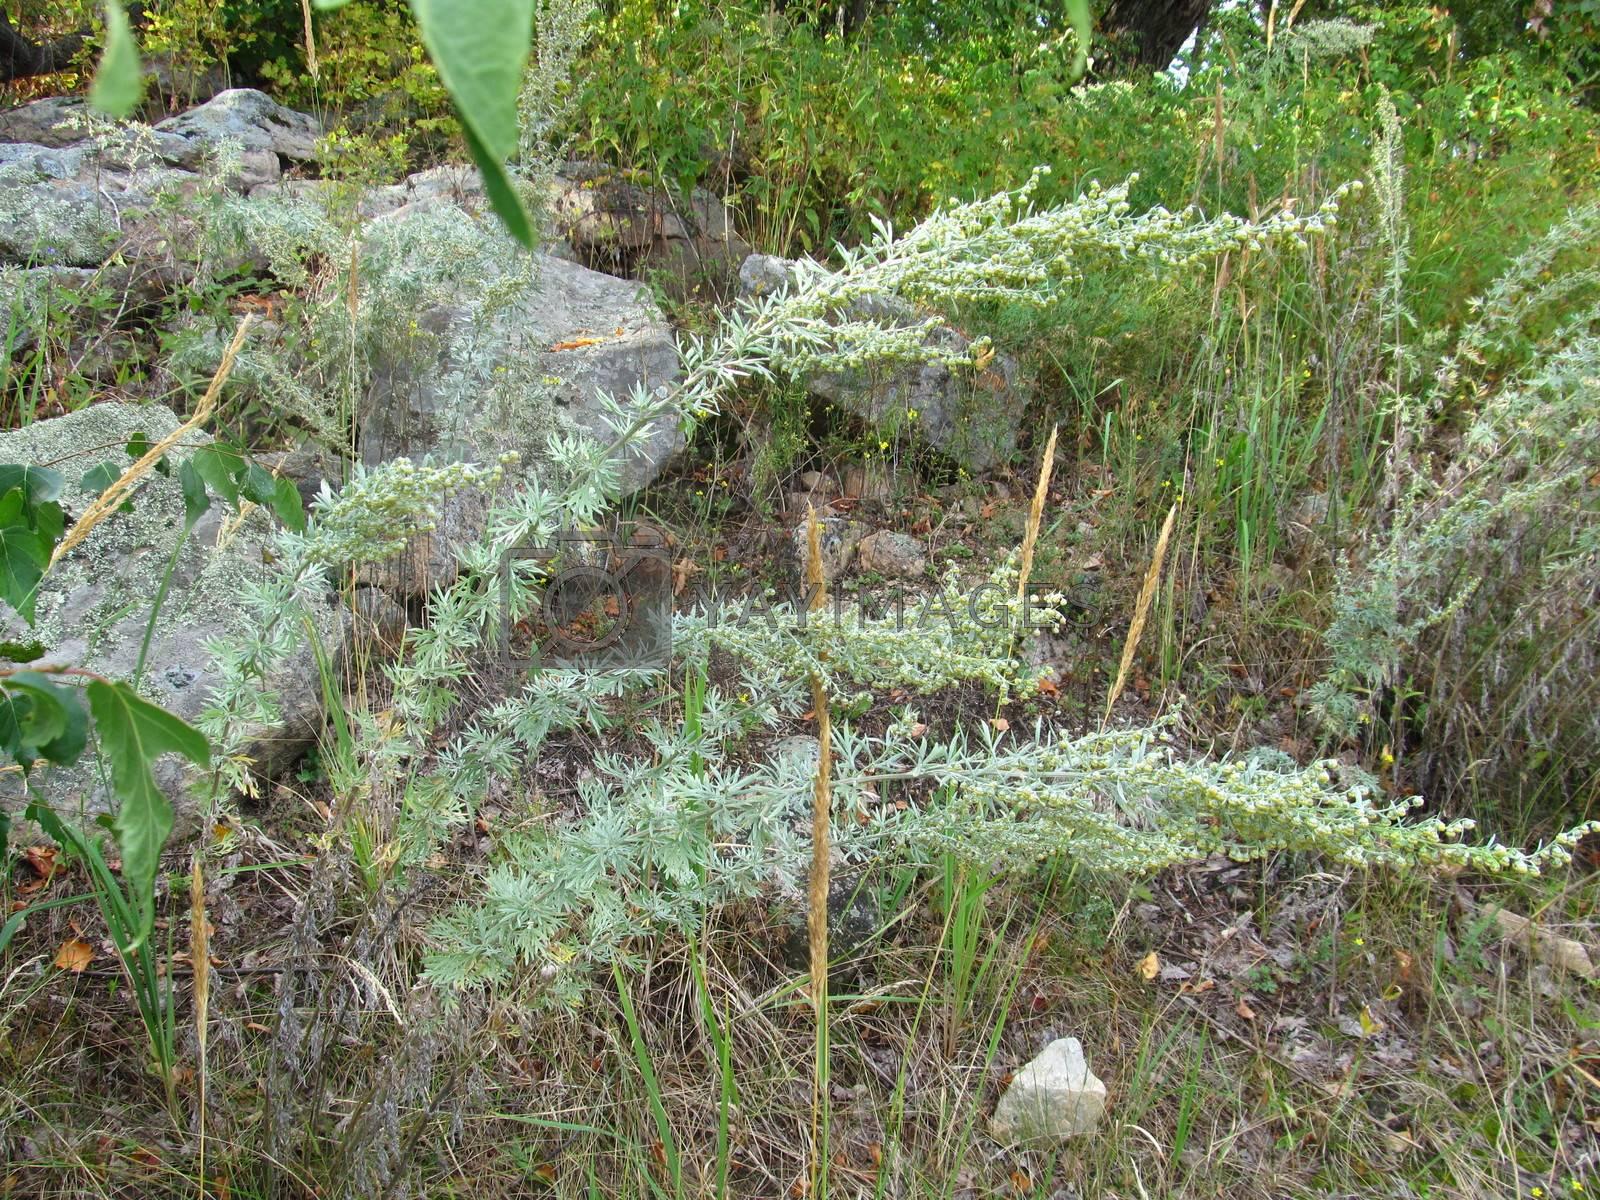 Royalty free image of sagebrush (Artemisia vulgaris) near forest stones by Aleksey_Gromov